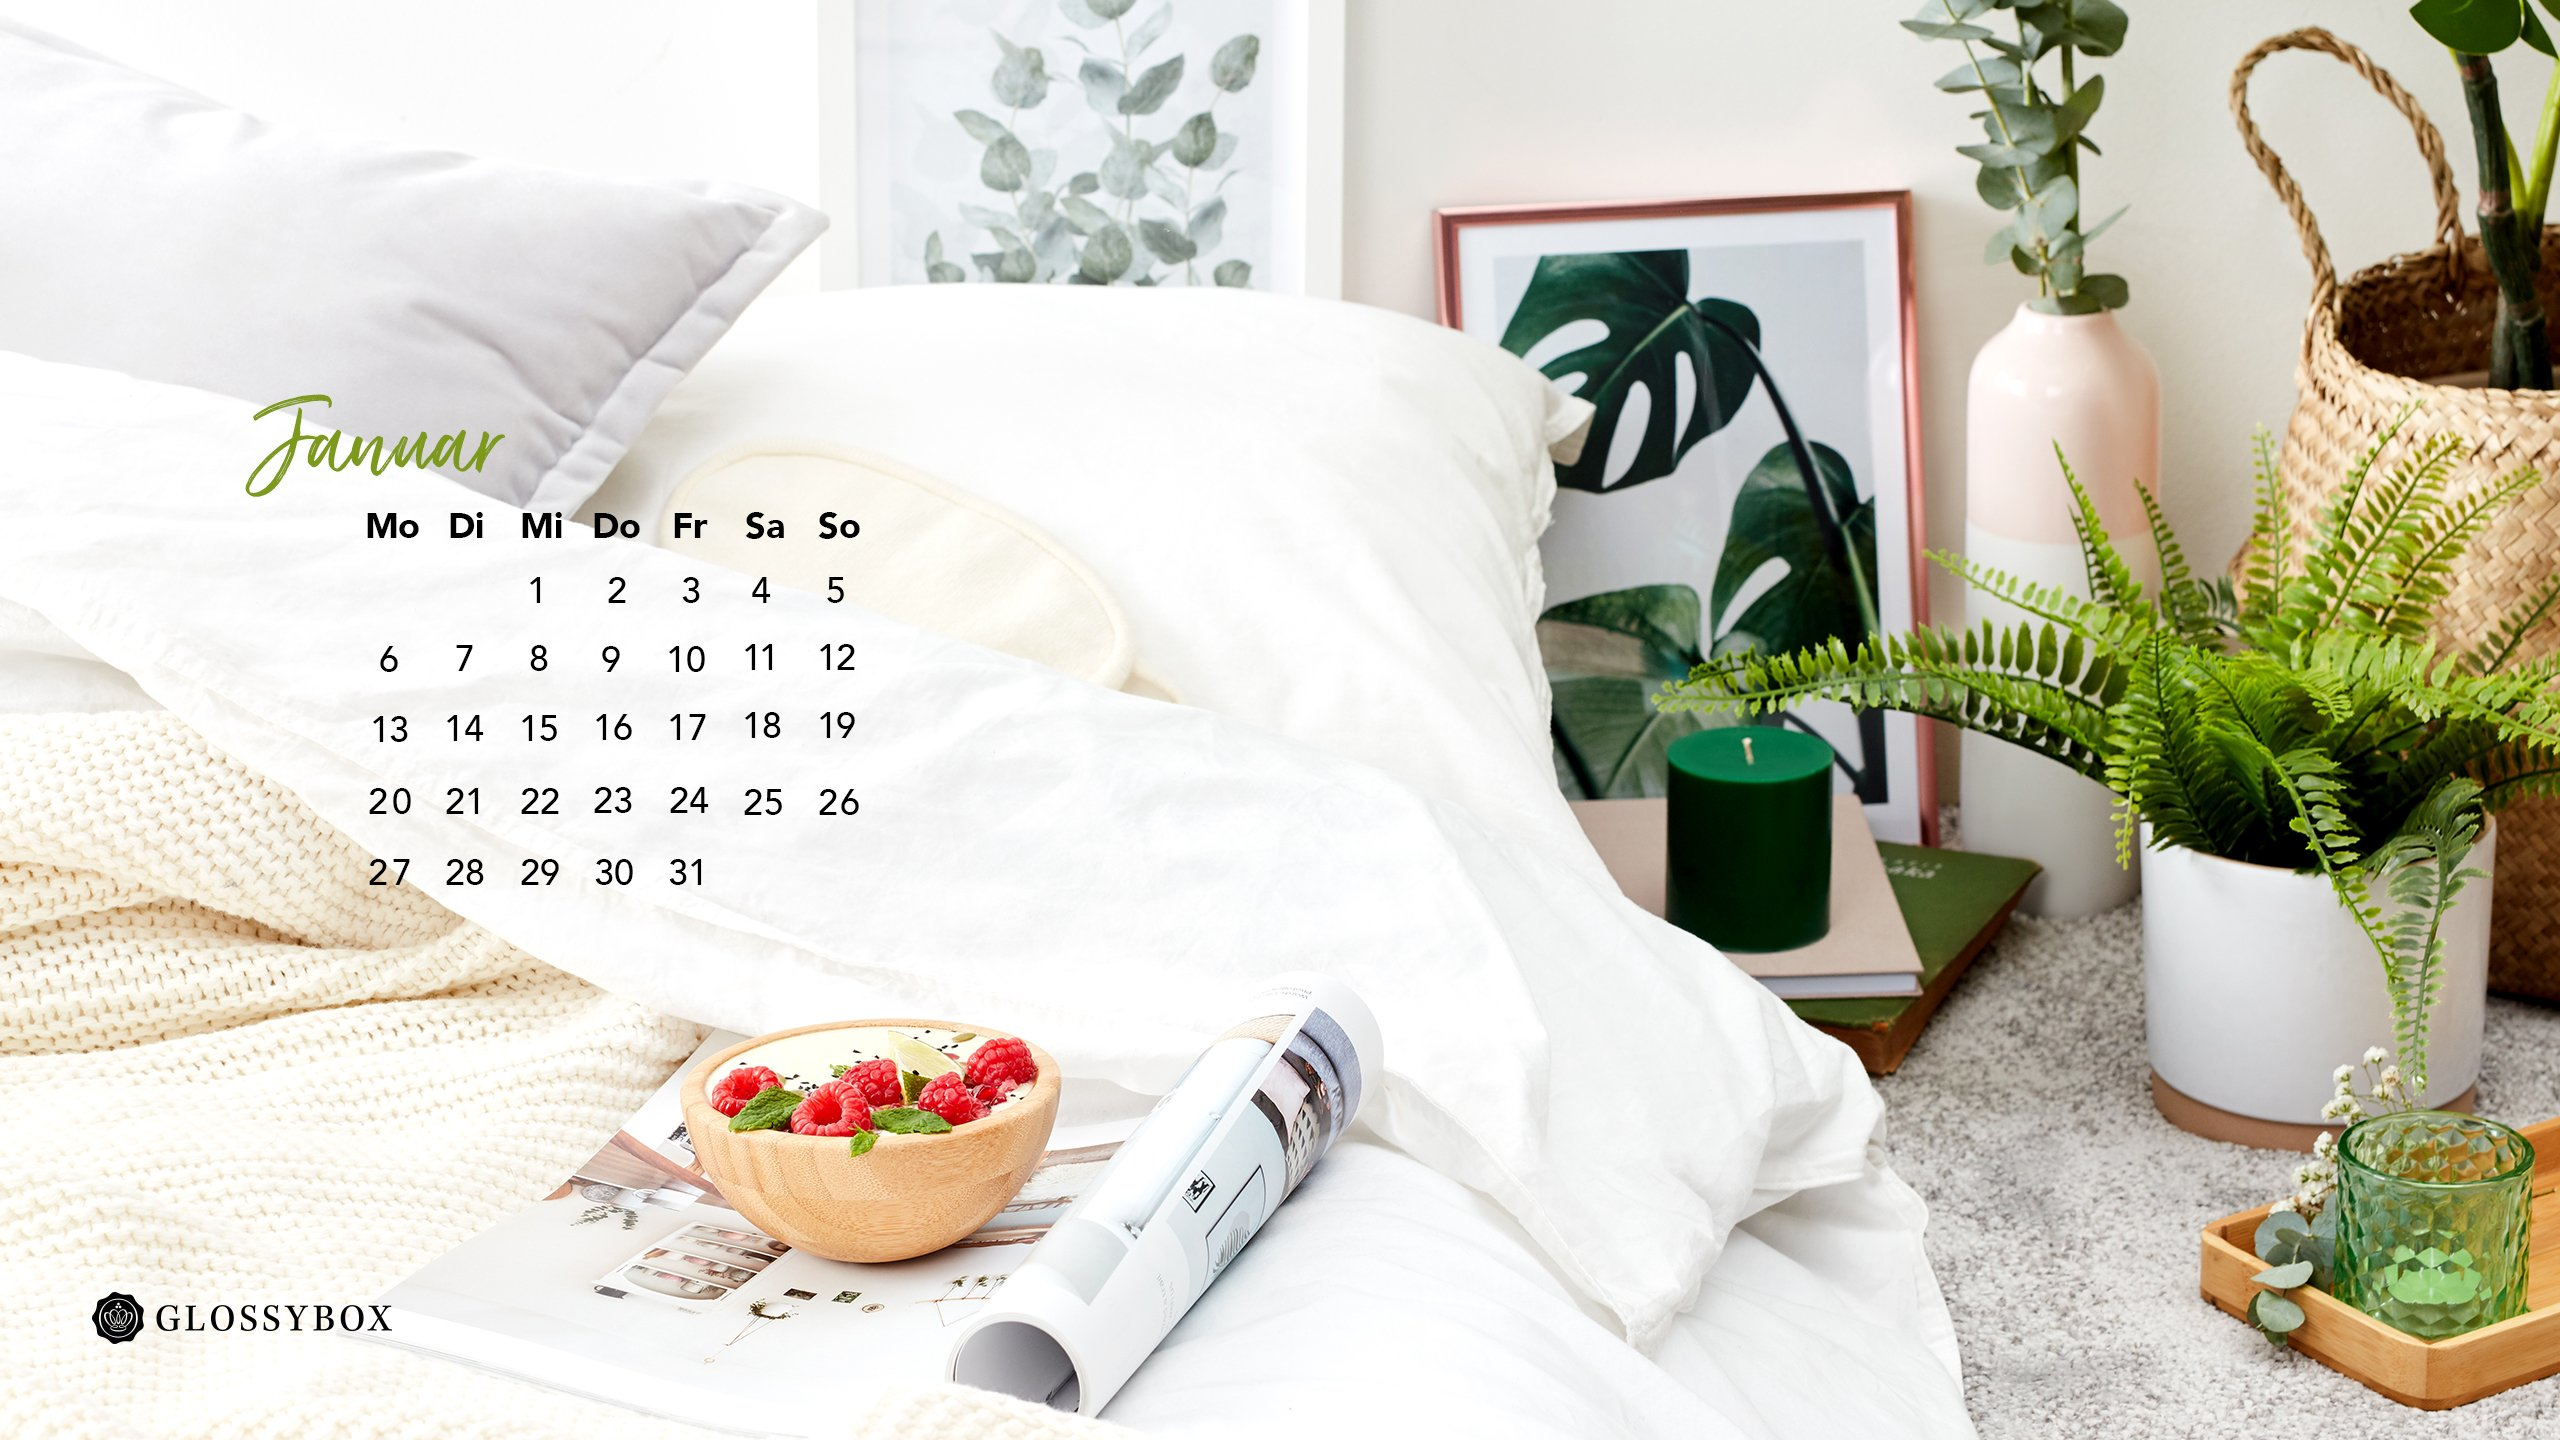 Wallpaper-Januar-GLOSSYBOX-sleep-and-refresh